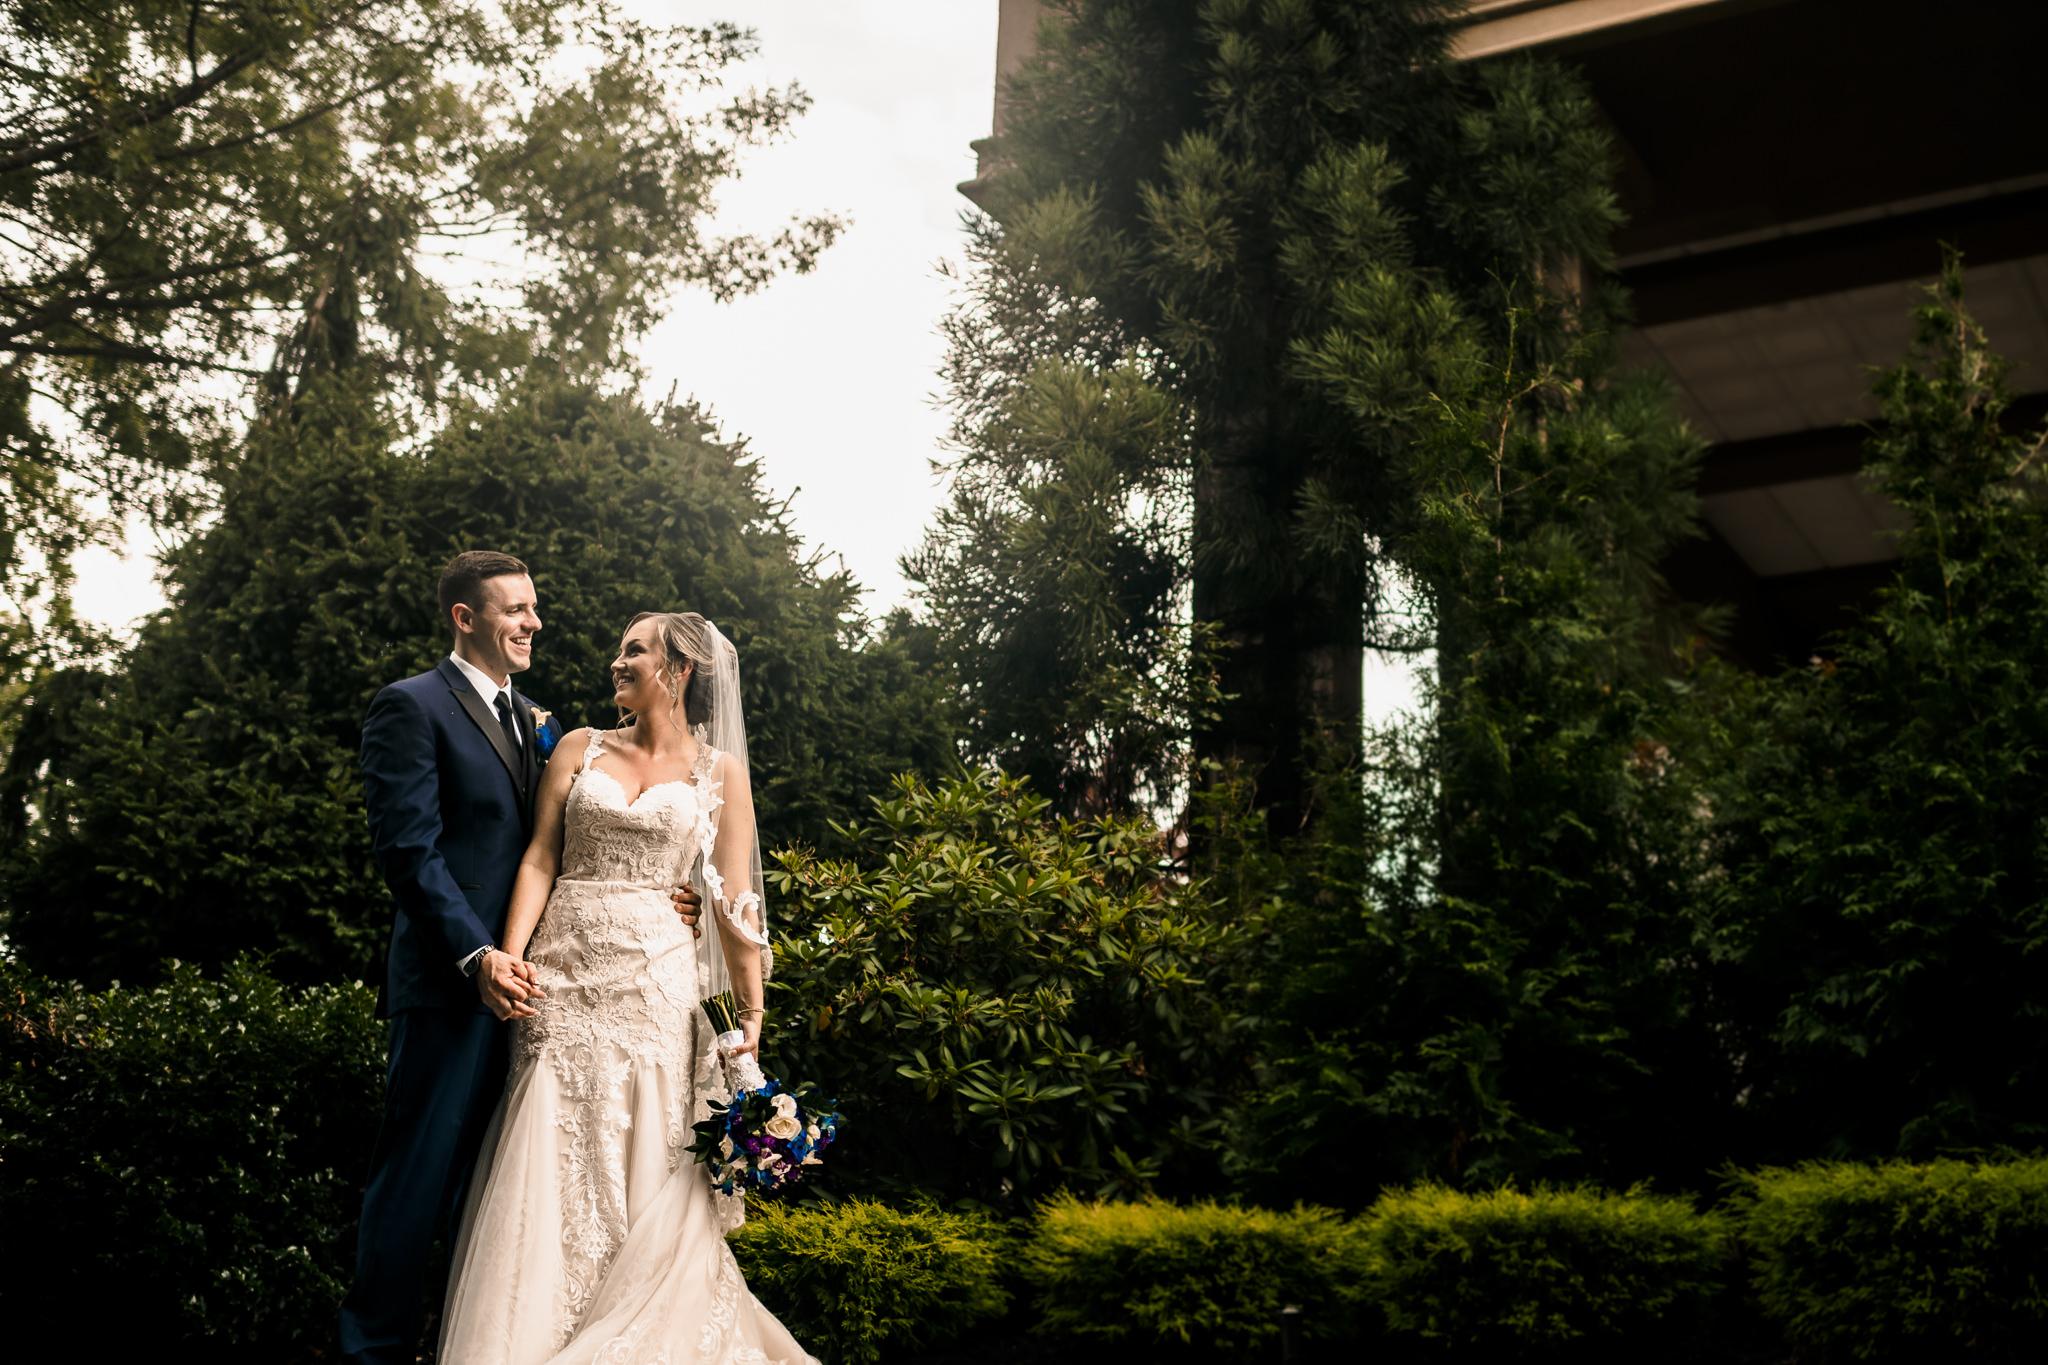 Brennan-South-Gate-Manor-New-Jersey-Wedding-Photographer-14.JPG